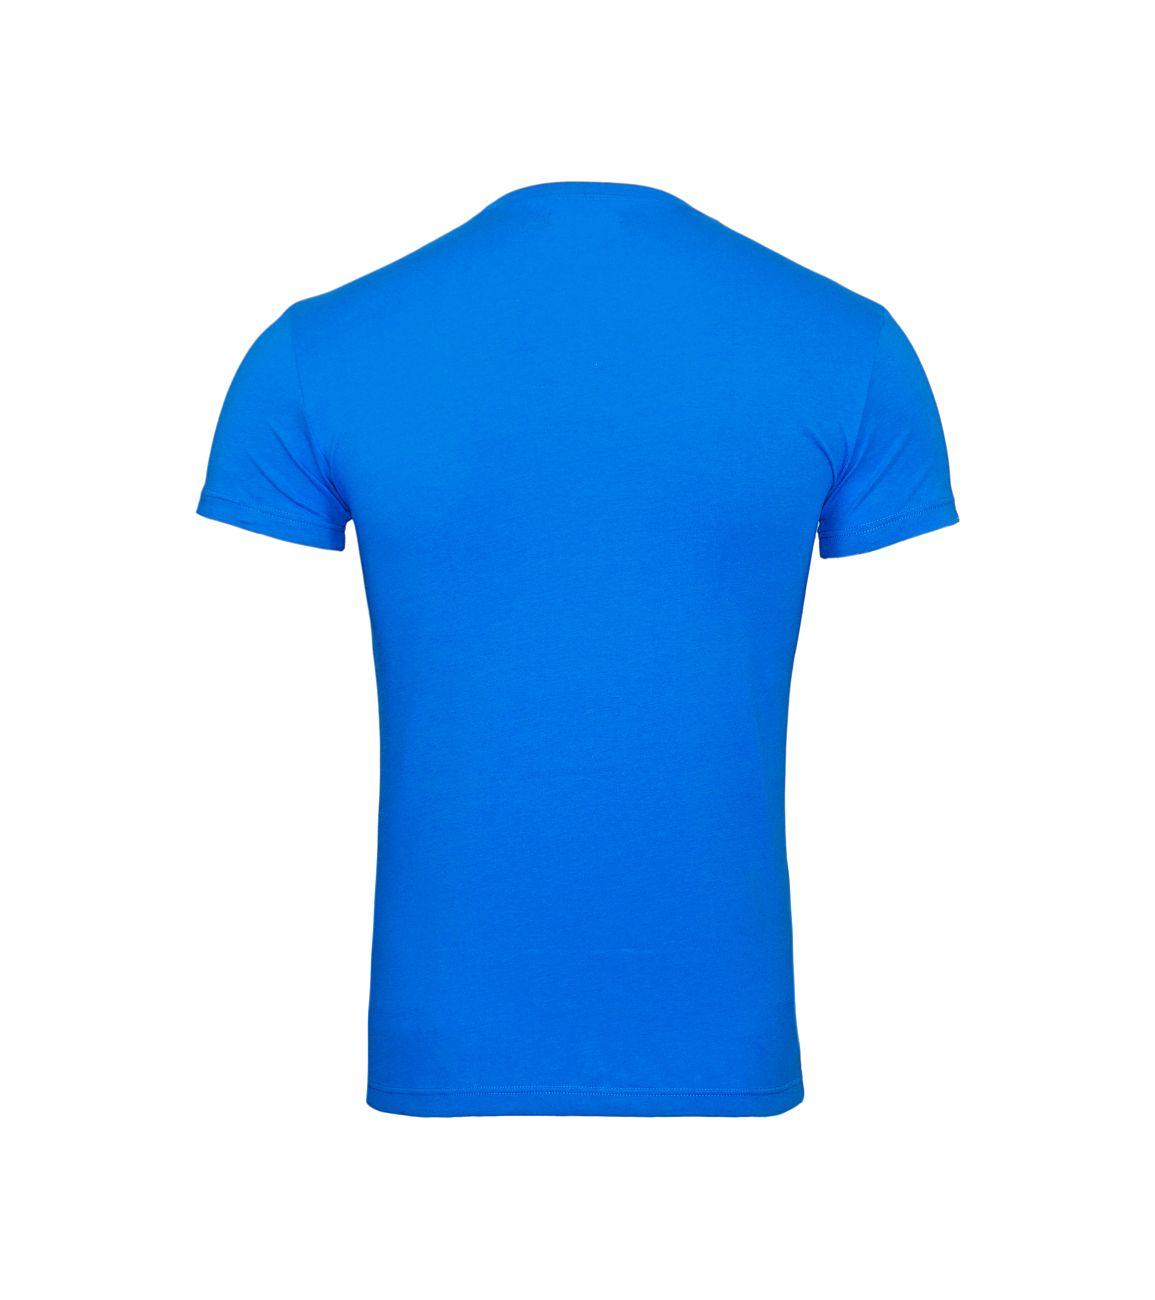 Emporio Armani T-Shirt Rundhals 111035 8P525 20833 CIELO F18-EAT1